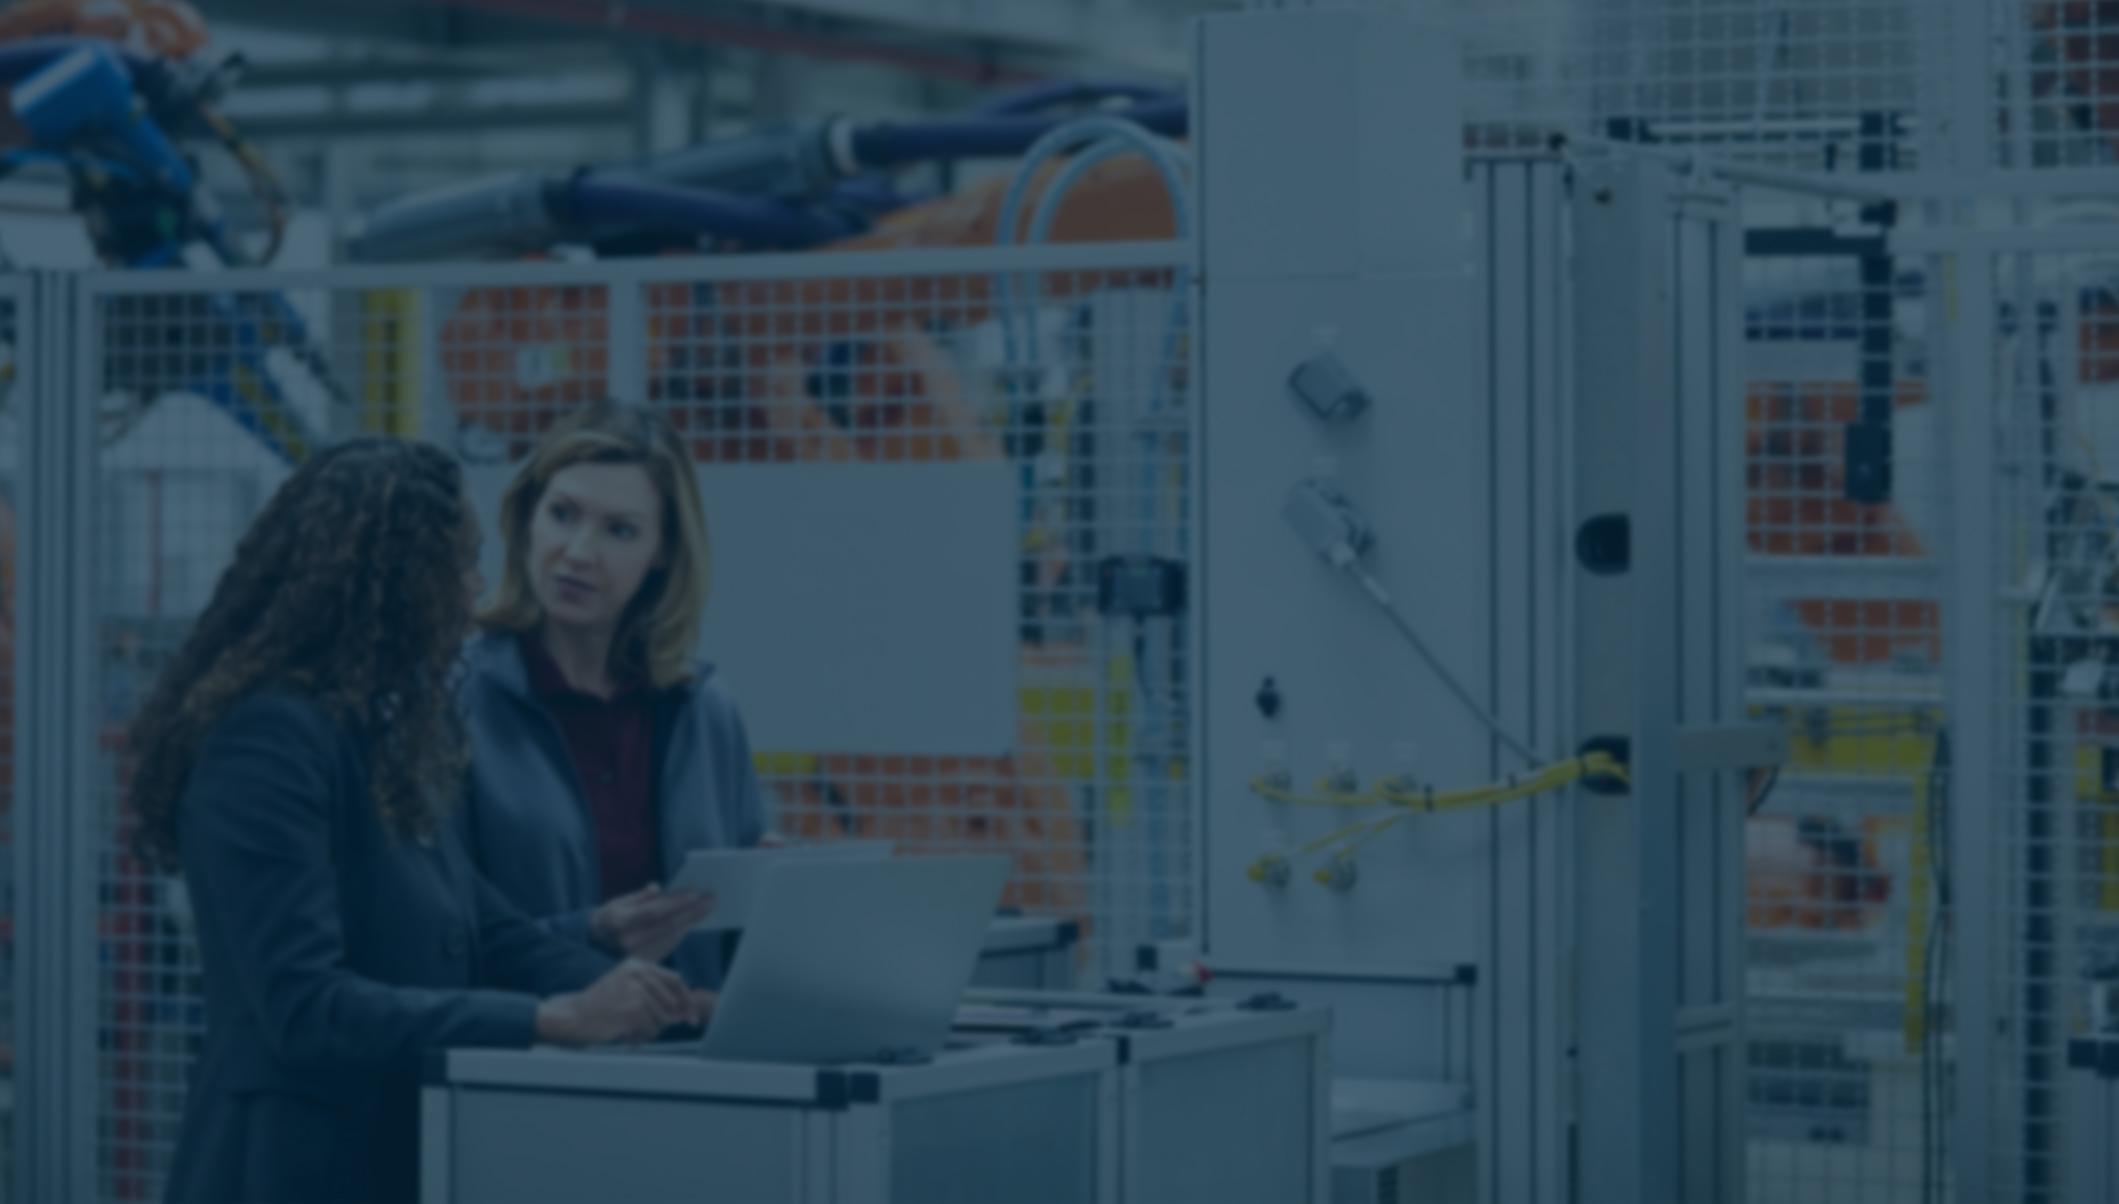 Download the Manufacturing Website Best Practices Checklist!